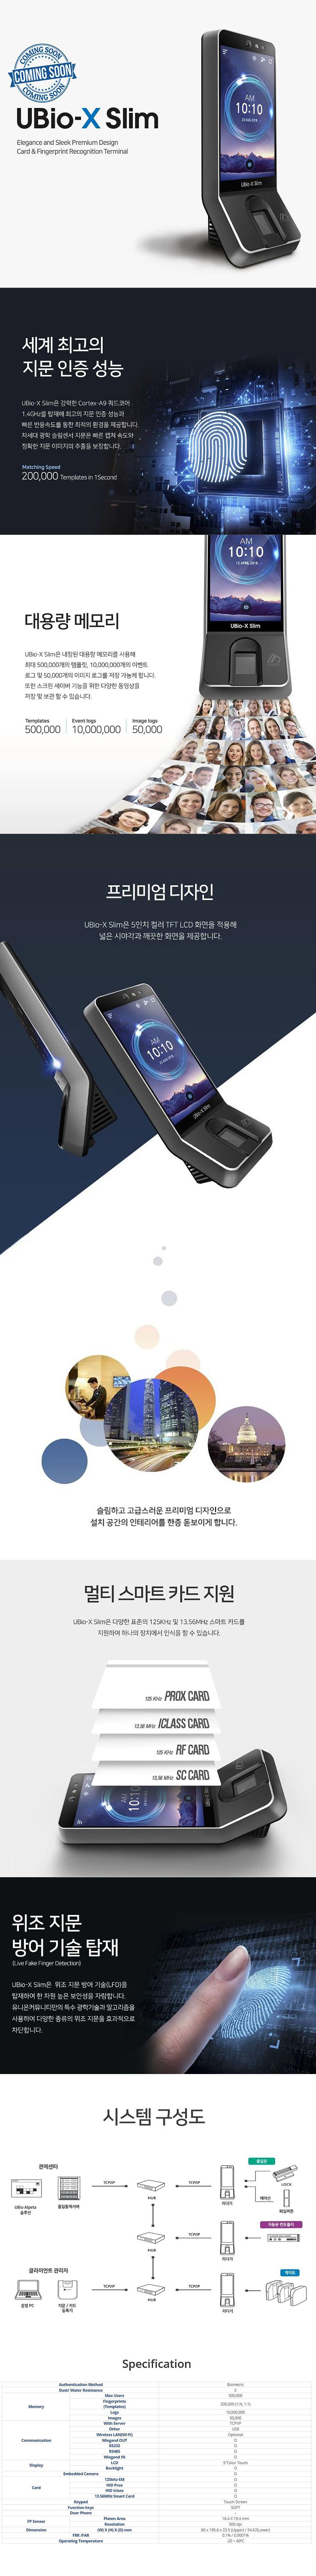 UBIO-X SLIM_intro-.jpg